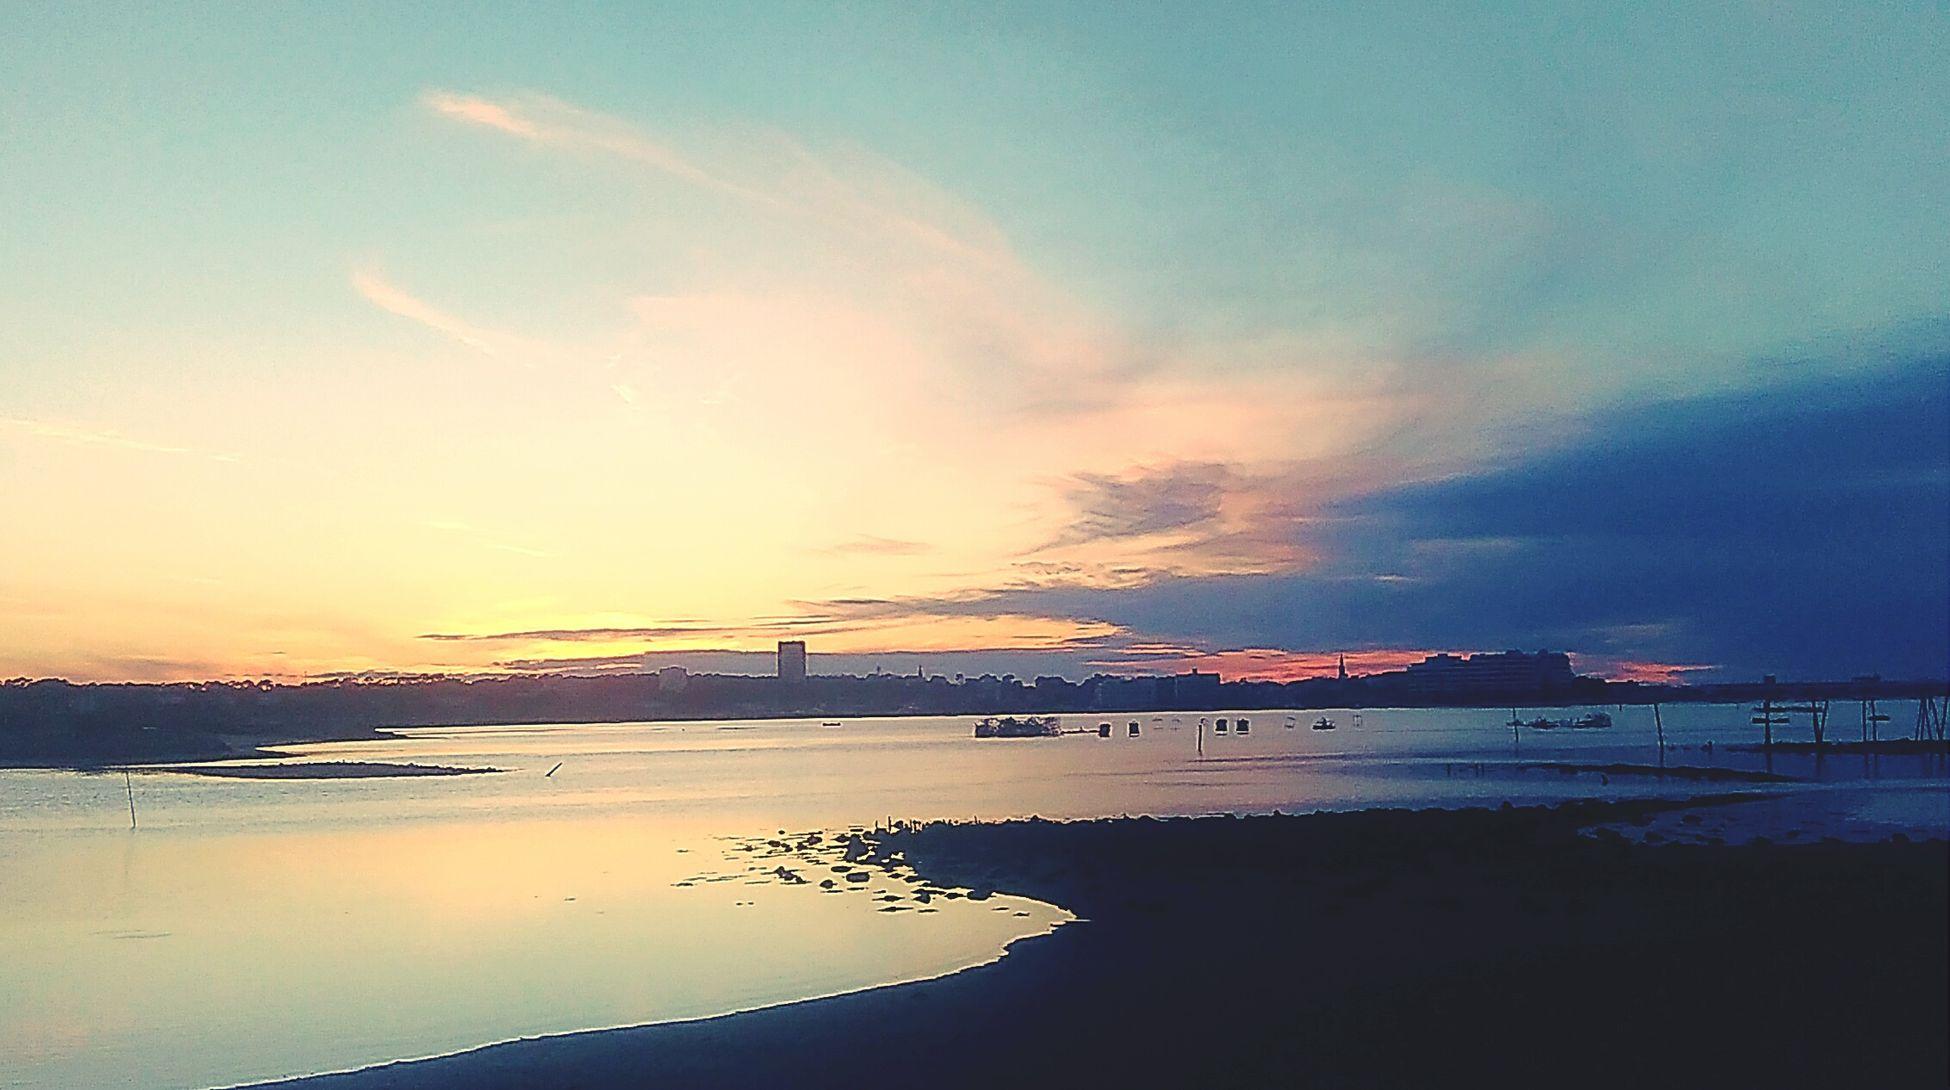 Port Du Rocher La Teste Lovelovelove Sunset #sun #clouds #skylovers #sky #nature #beautifulinnature #naturalbeauty #photography #landscape